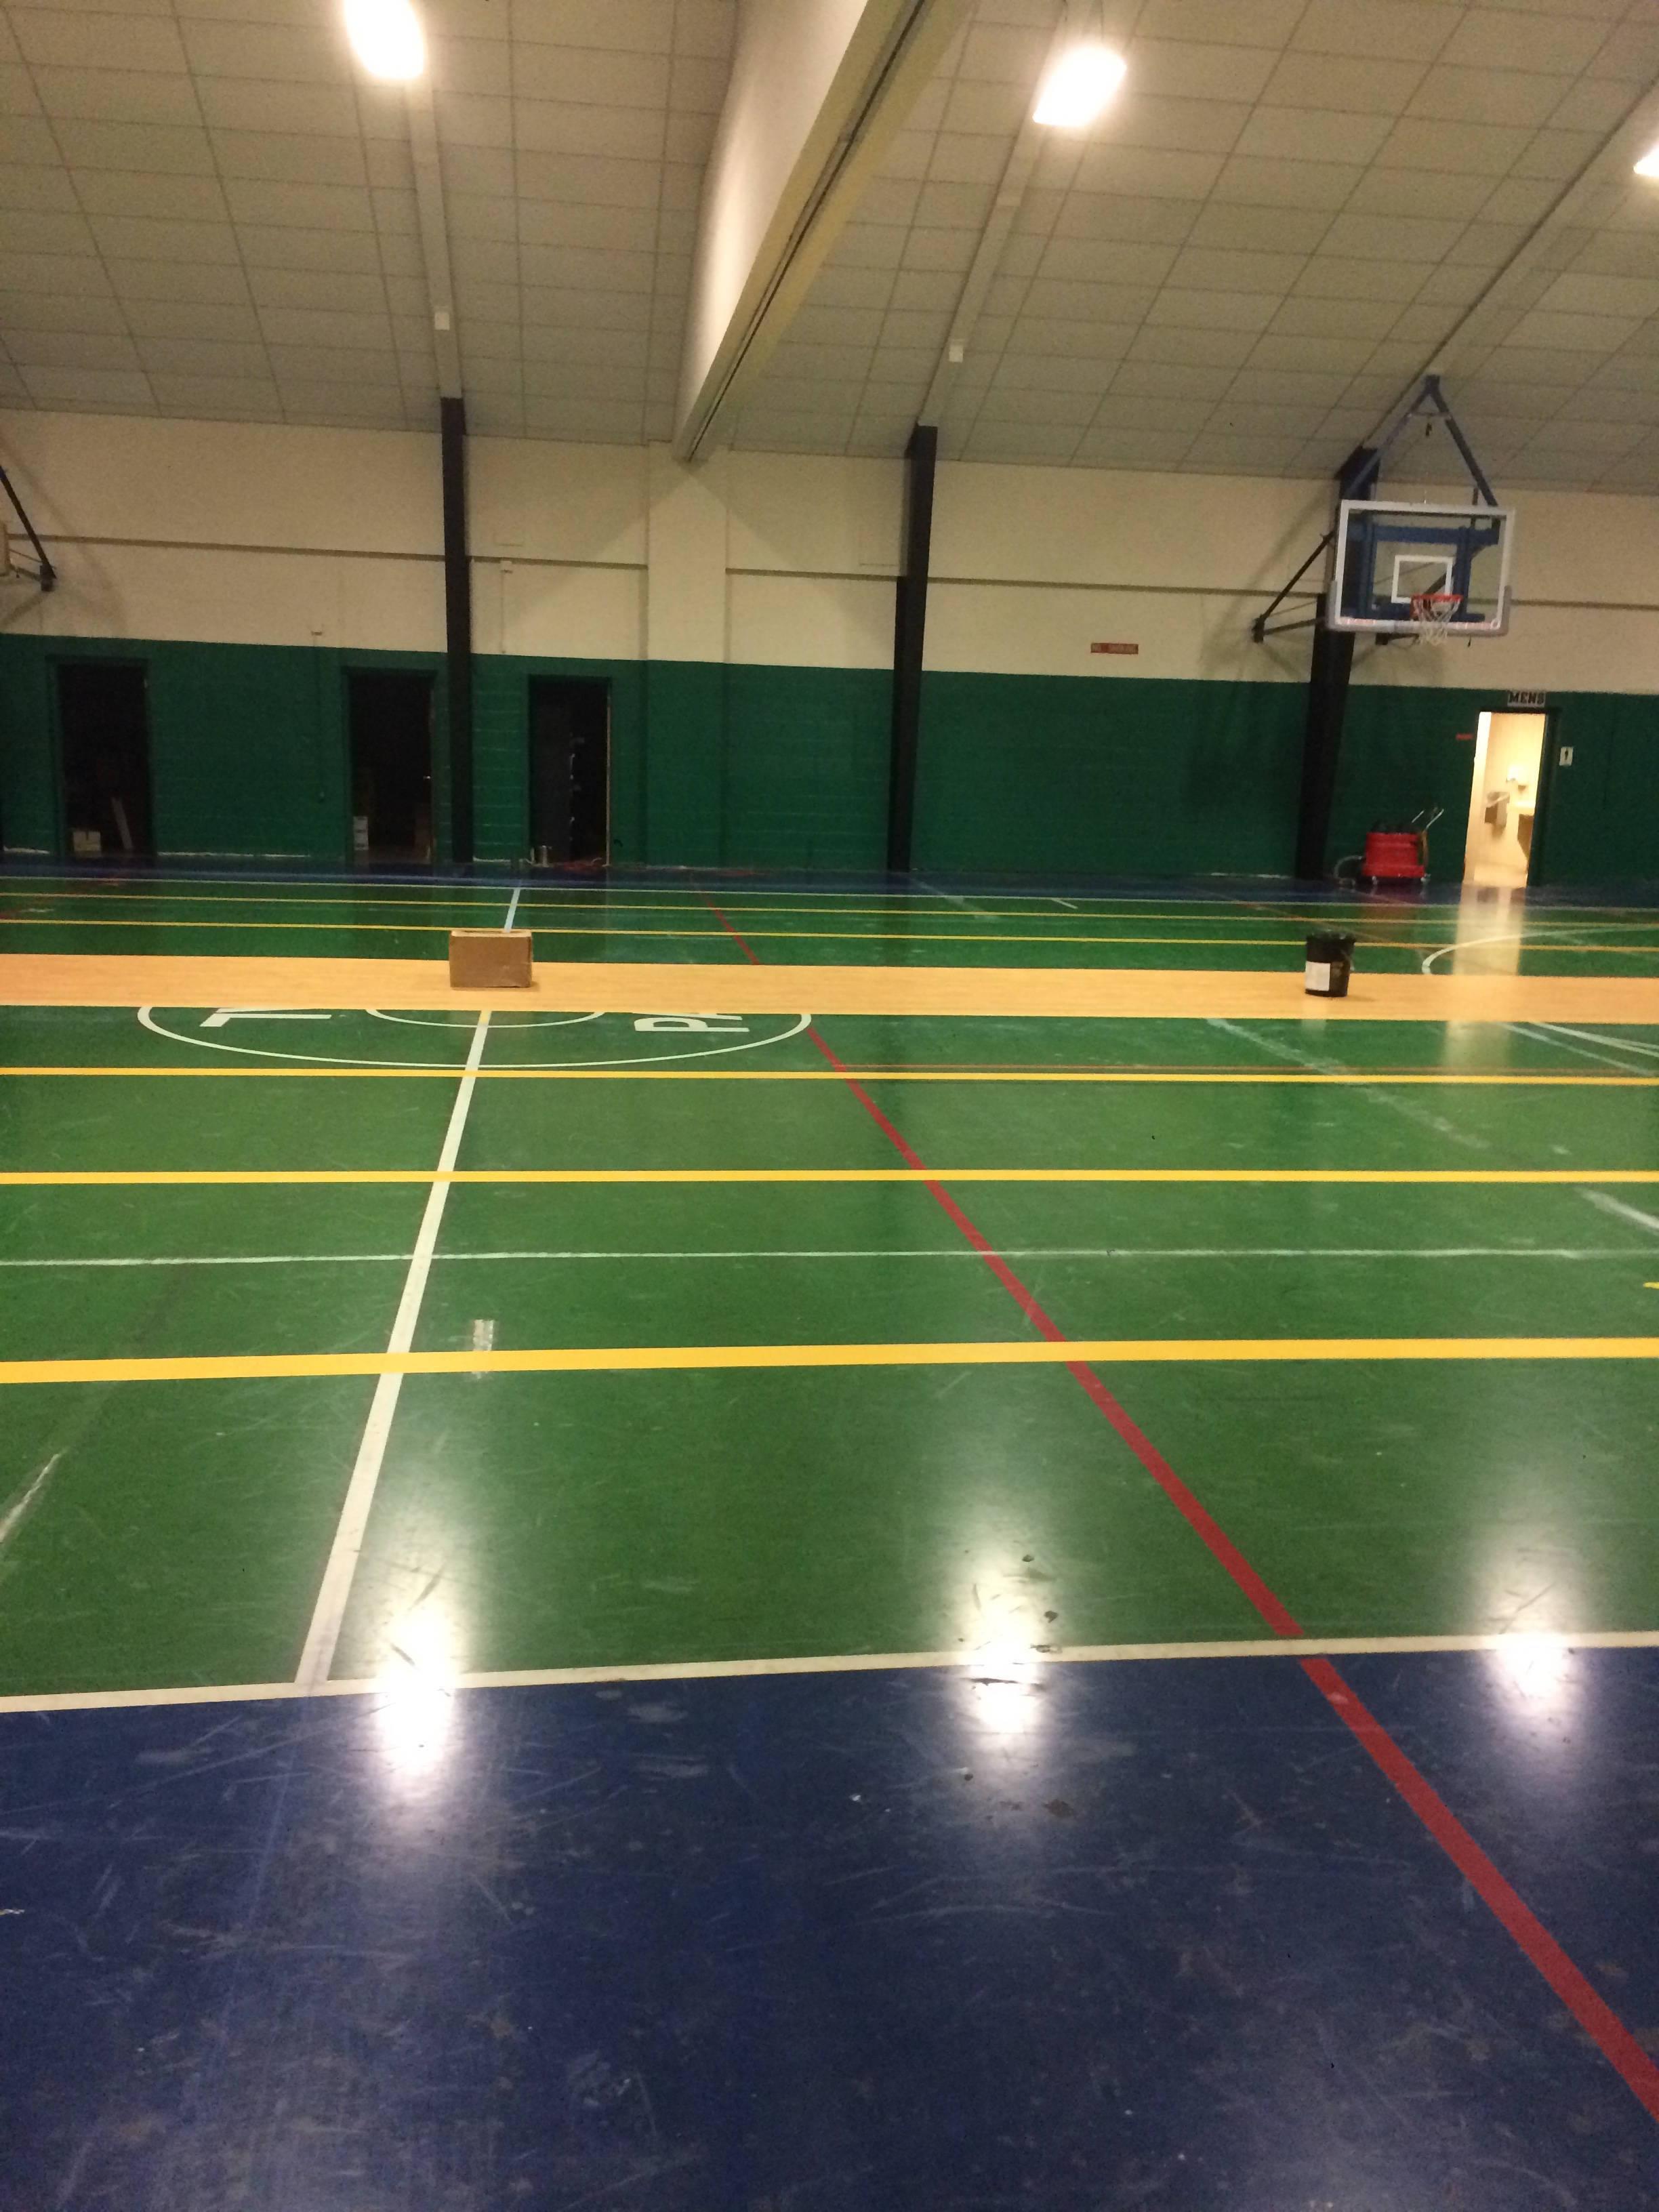 Gym at South Plainfield PAL Recreation Building Gets Major Facelift